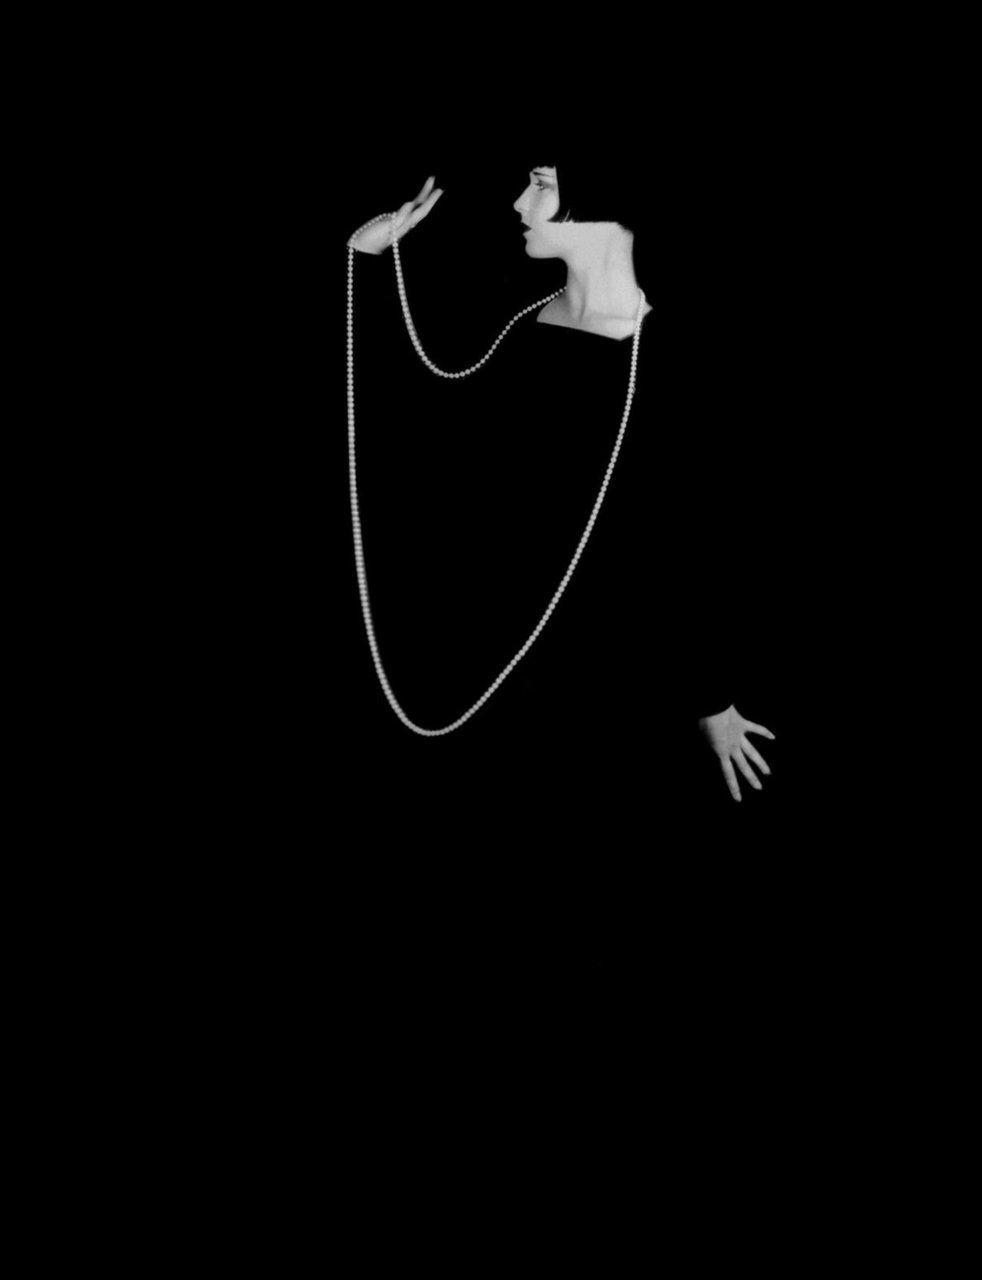 Louise Brooks, 1928  Photographer: Eugene Robert Richee